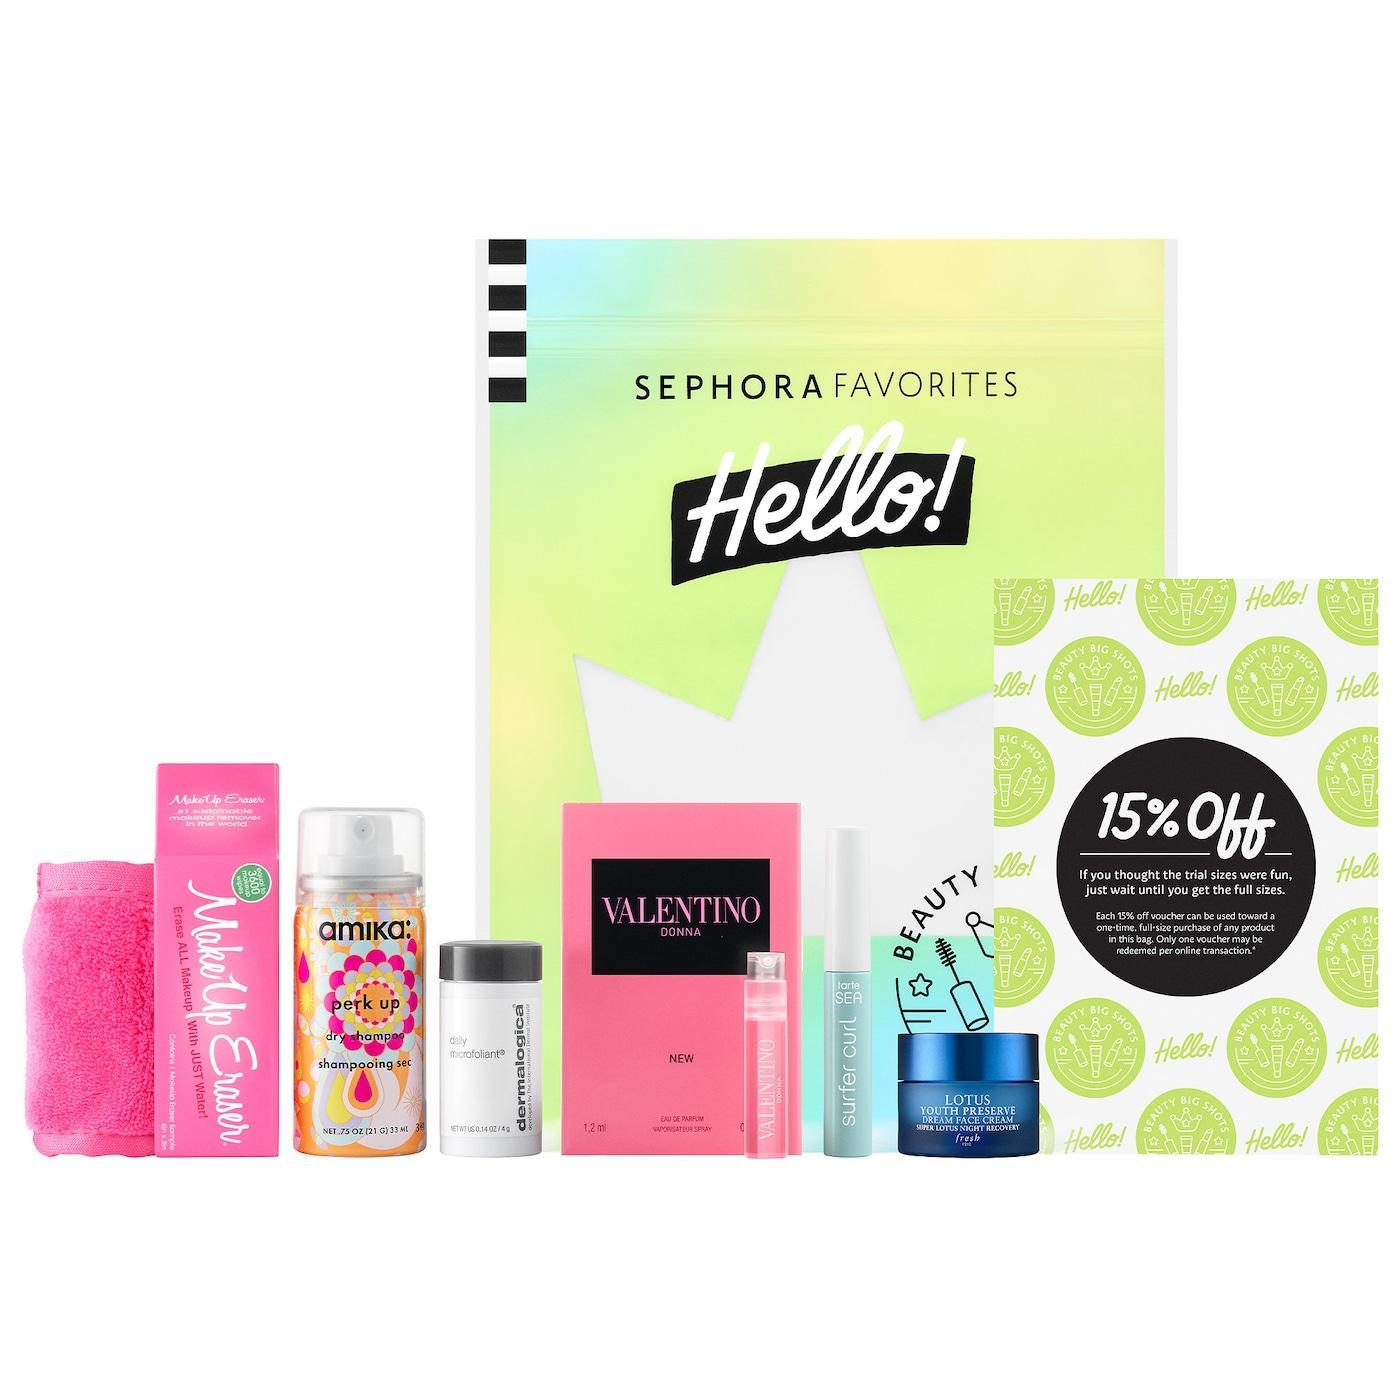 Sephora Favorites Hello! Greatest Beauty Hits – On Sale Now!